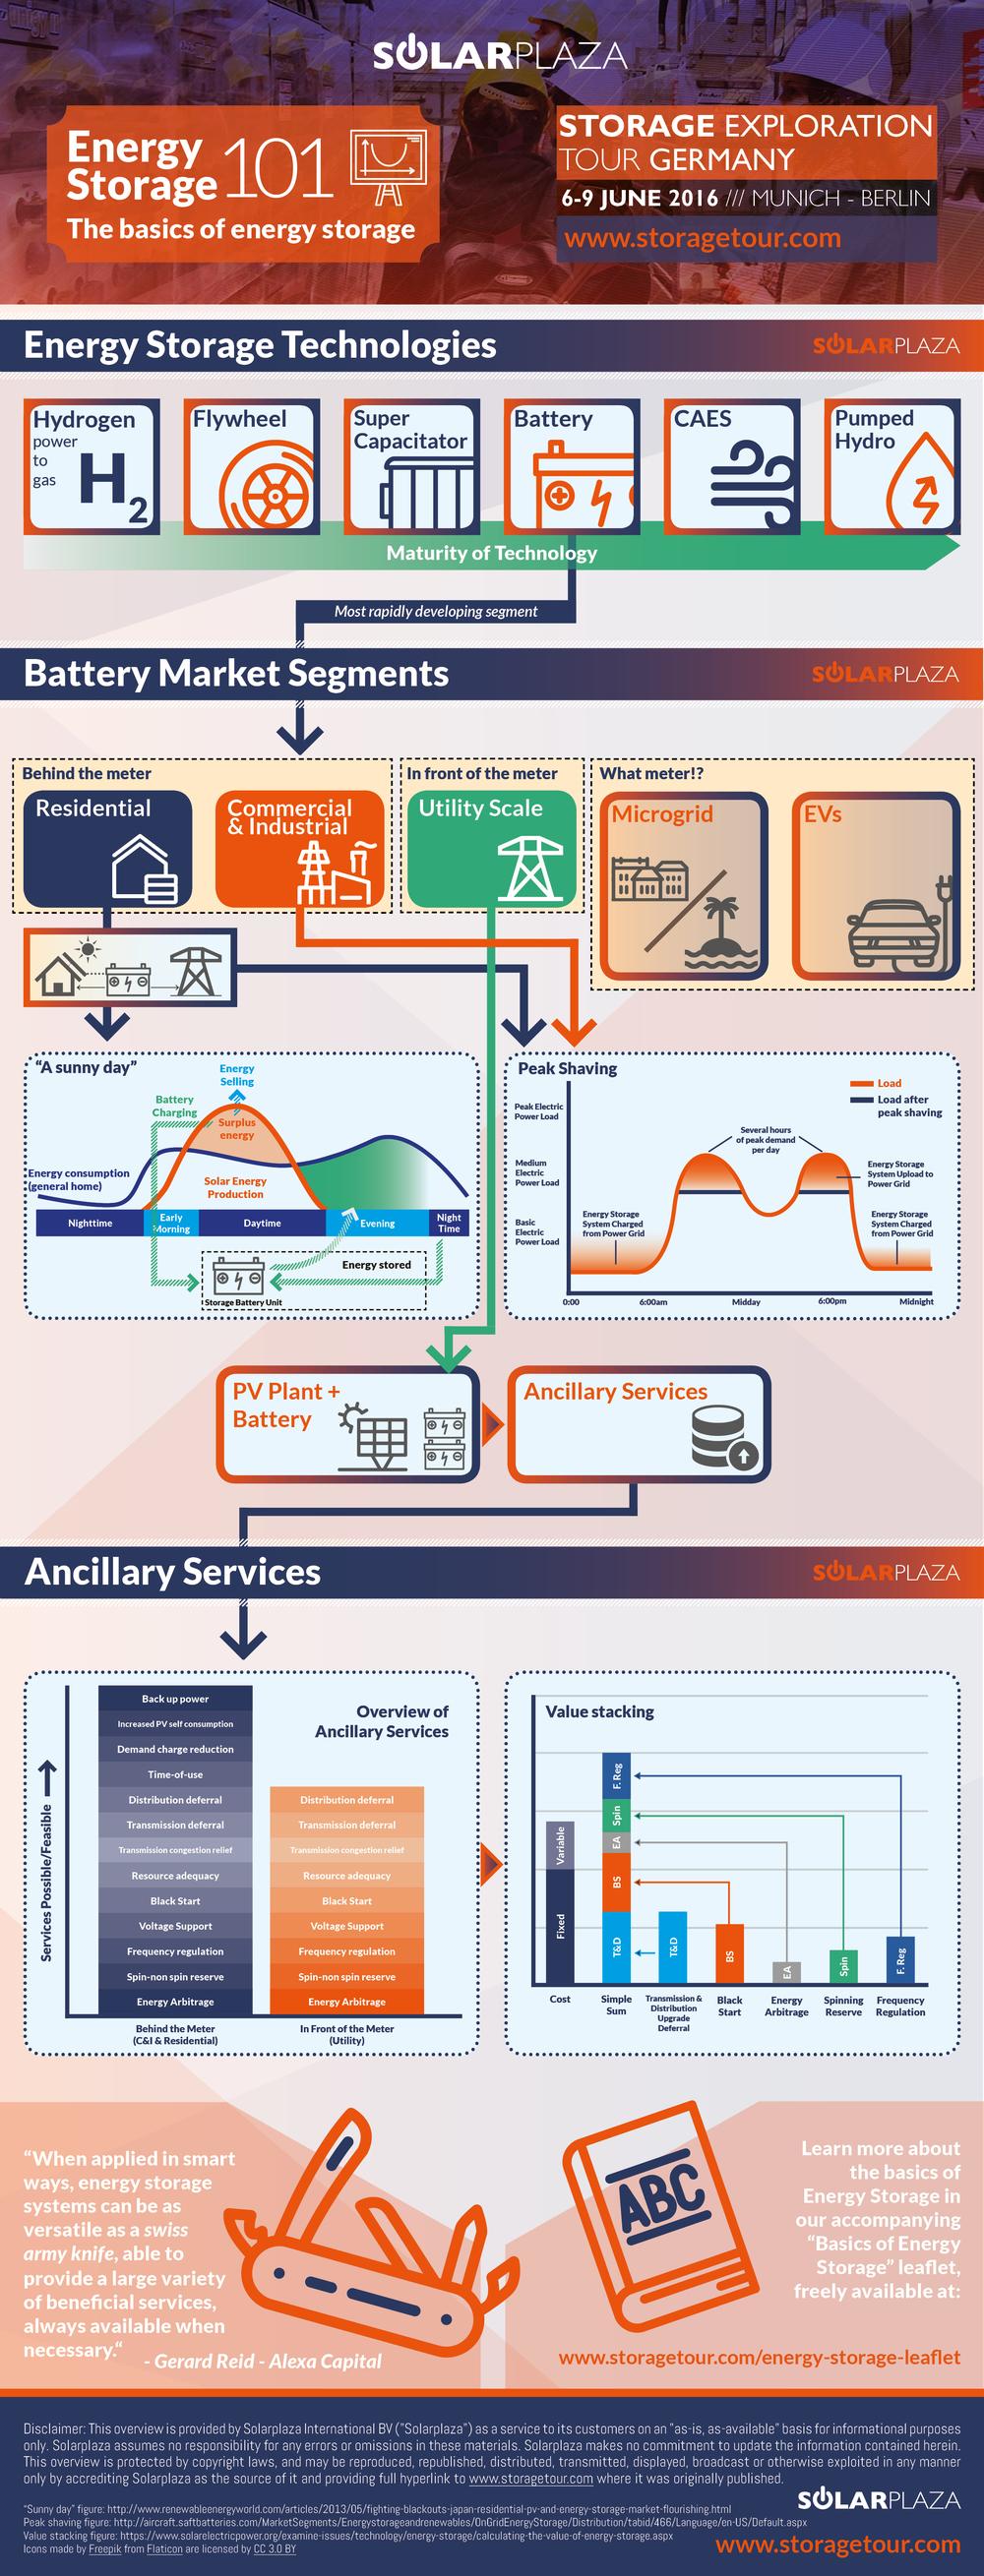 Infographic - Basics of Energy Storage 3 (jpg).jpg